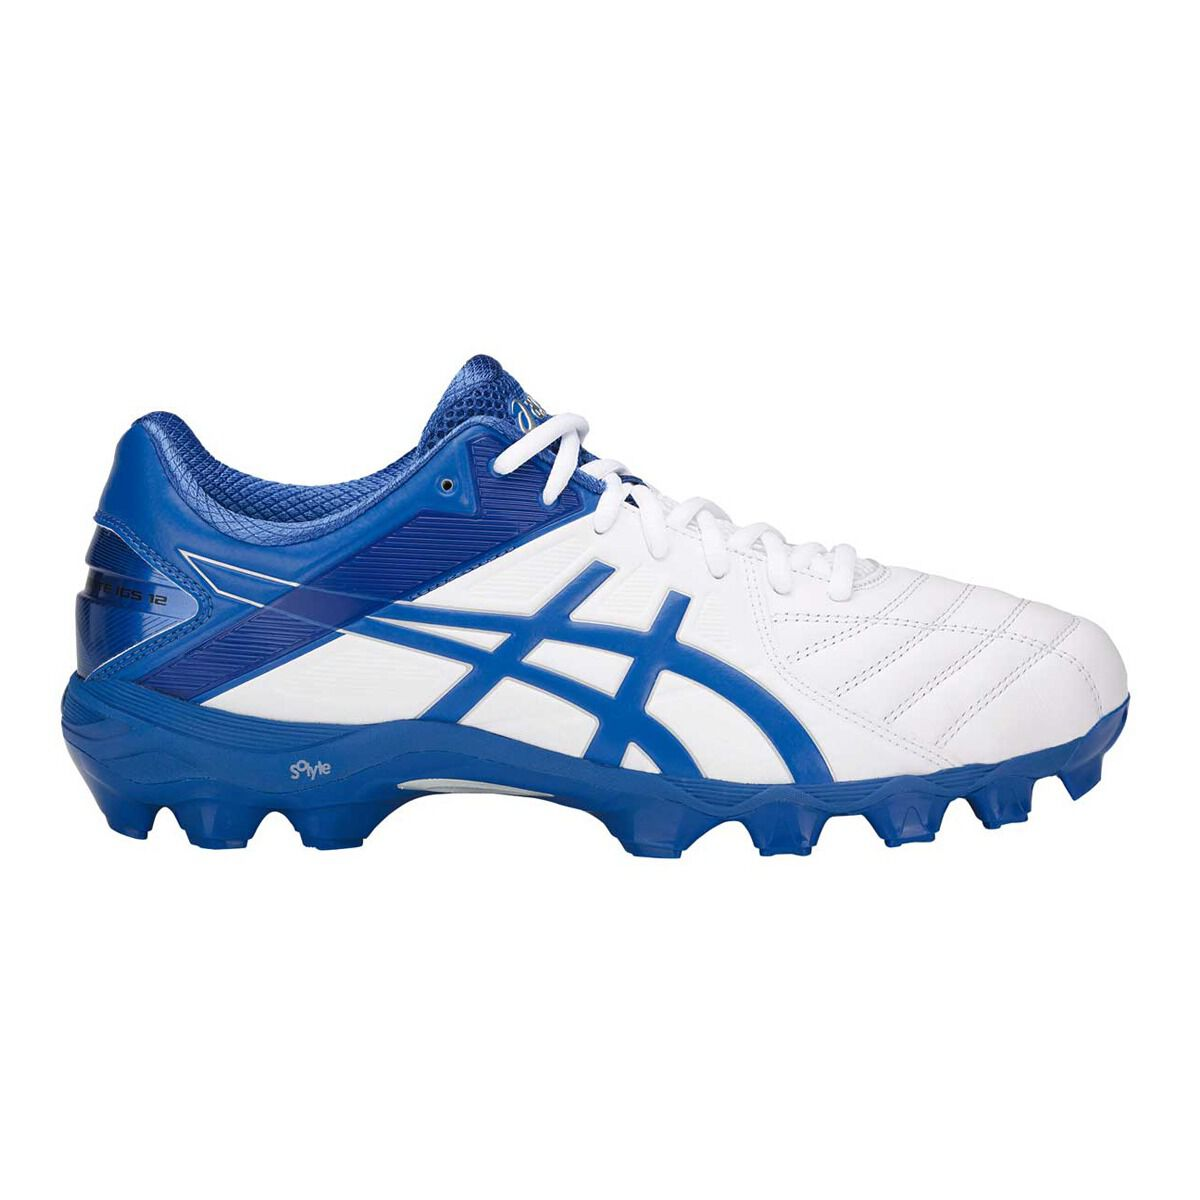 white asics football boots